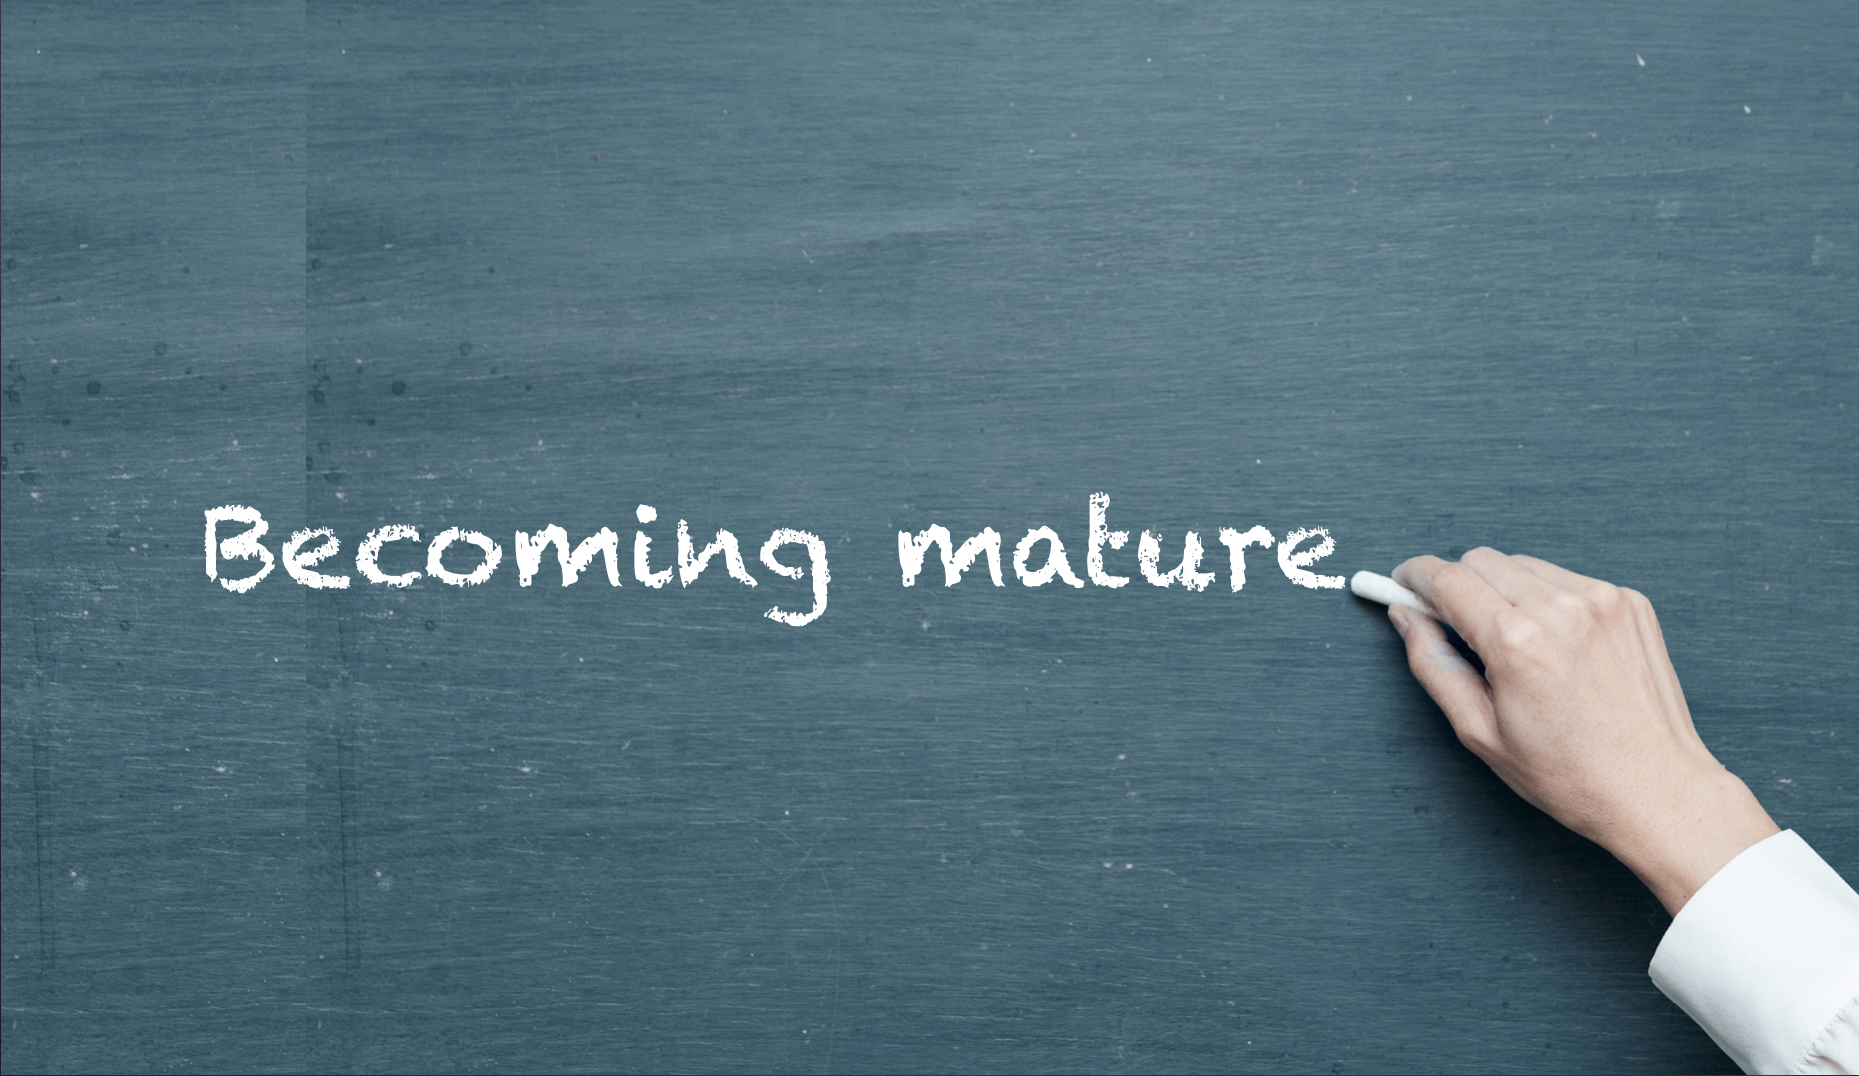 Becoming_mature.png